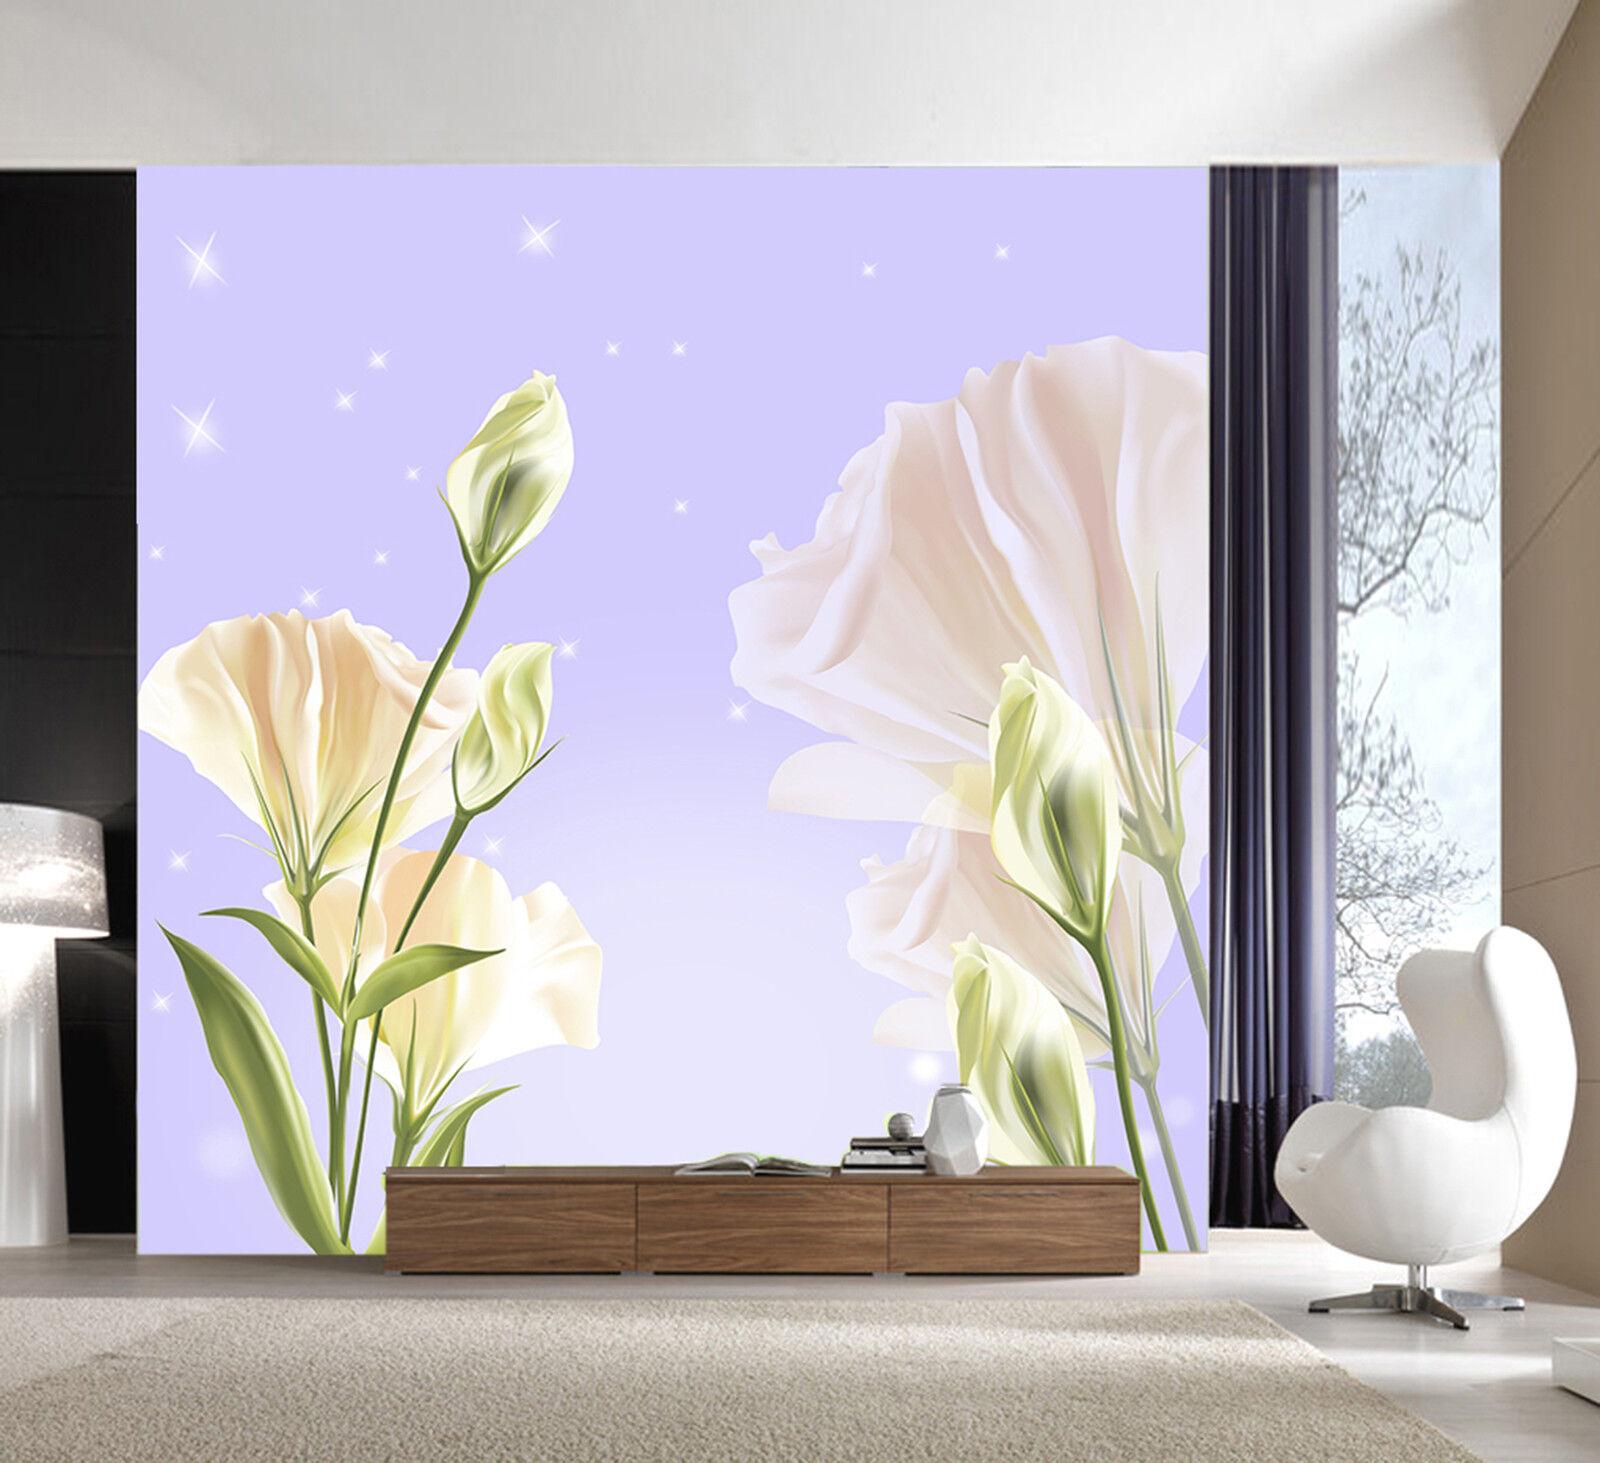 3D Blühende Blumen Fototapeten Wandbild Fototapete Bild Tapete Familie KinderDi